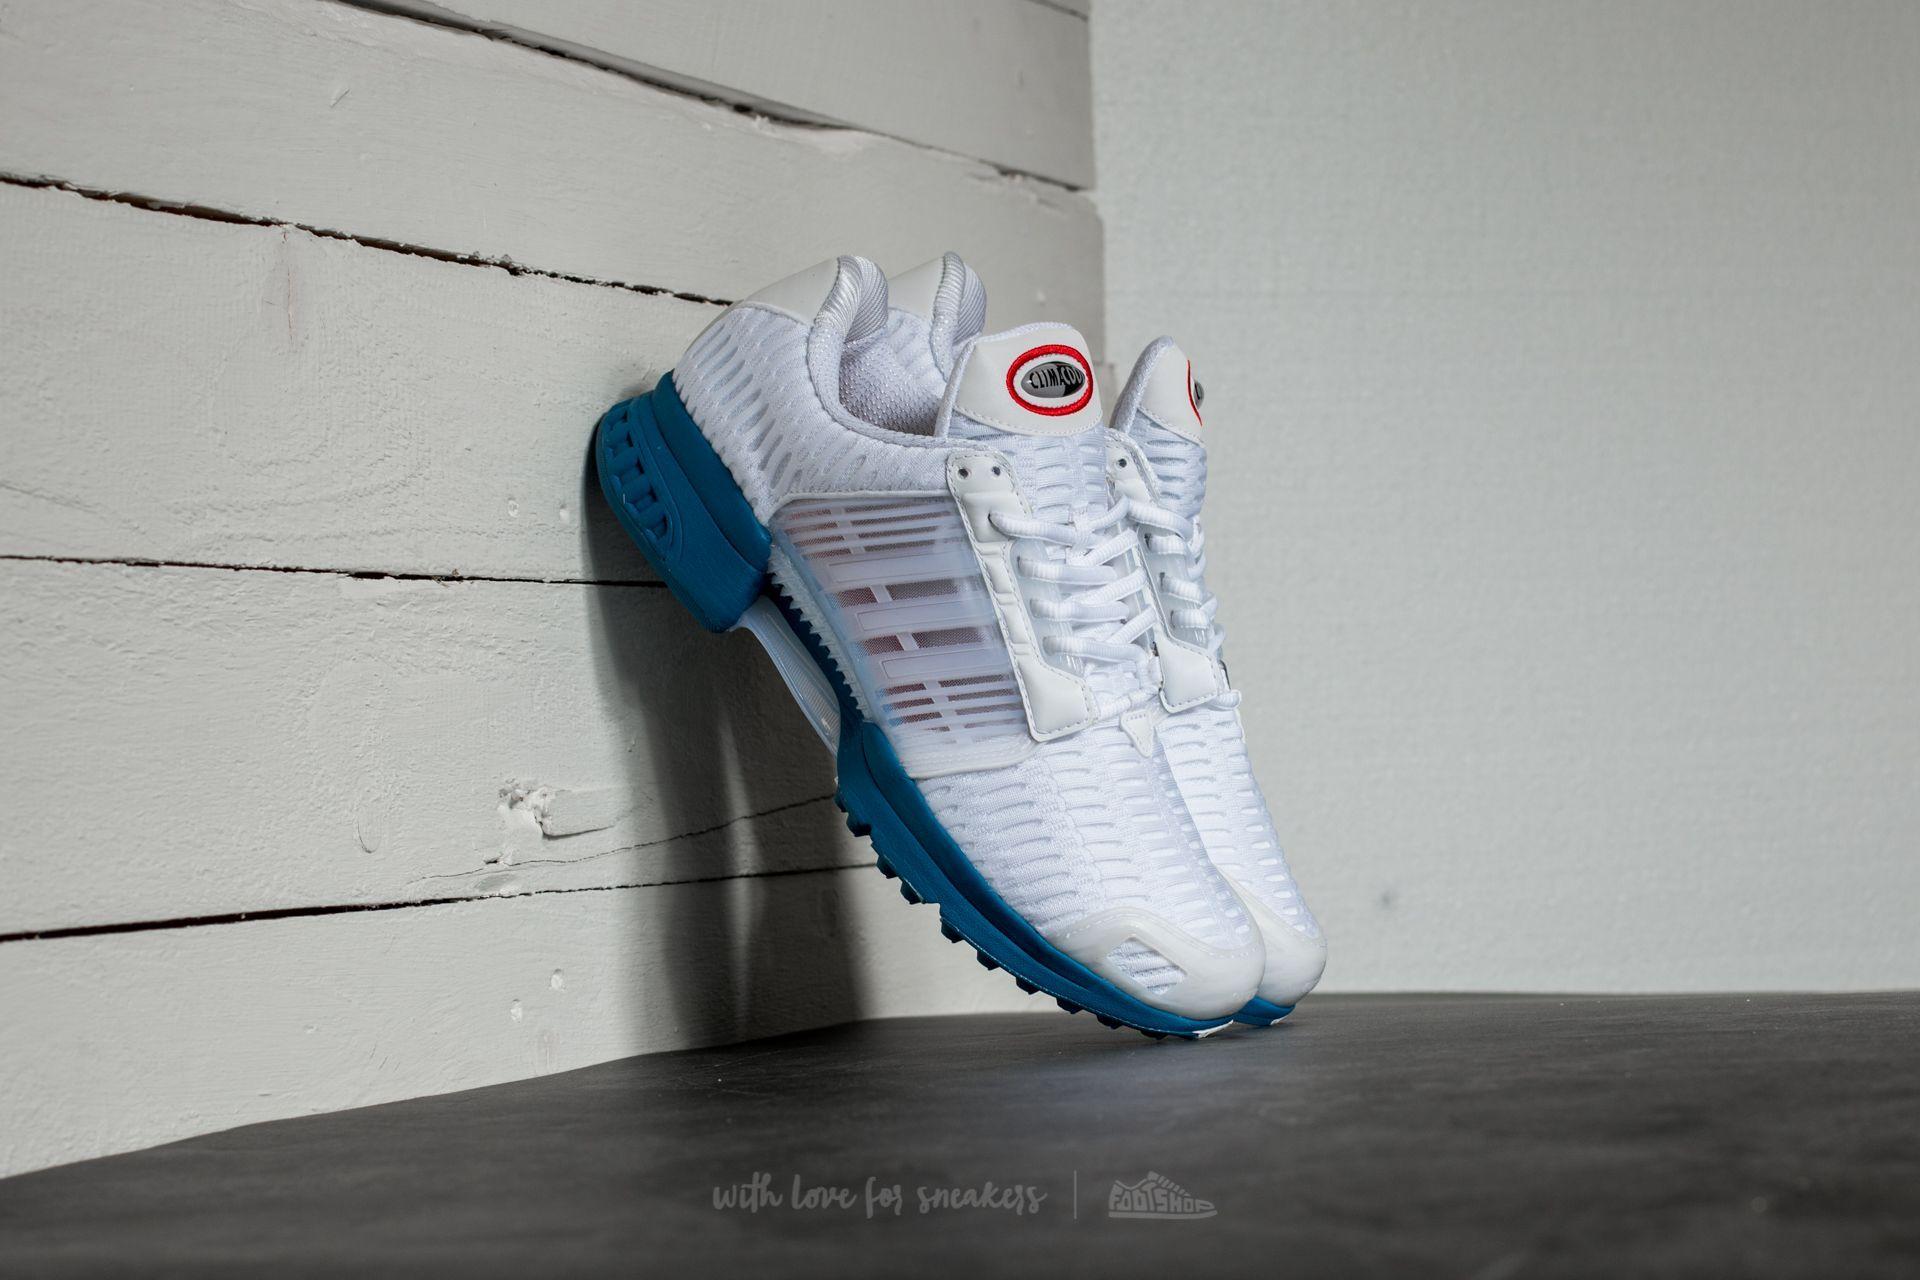 adidas climacool 1 ftw bianco / ftw bianco / nucleo blu ad un ottimo prezzo